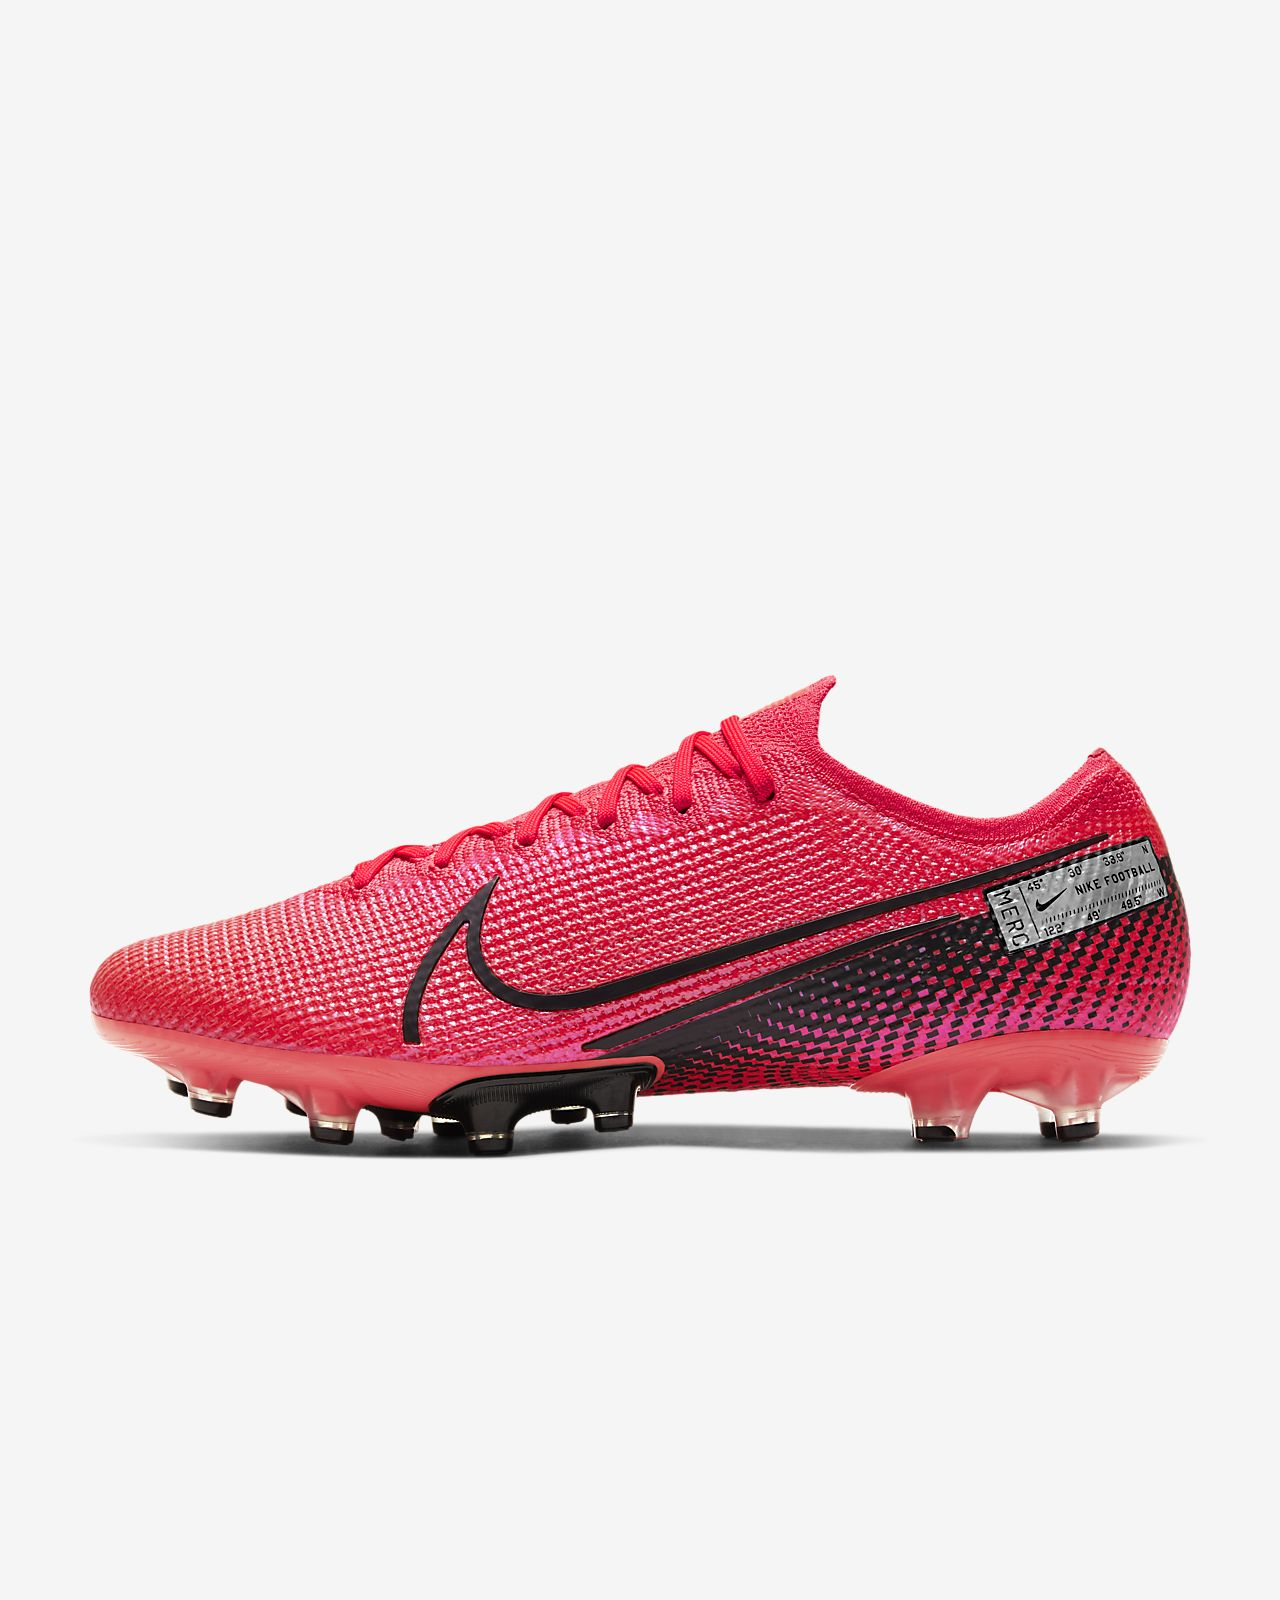 Nike Mercurial Vapor 13 Elite AG-PRO Artificial-Grass Football Boot